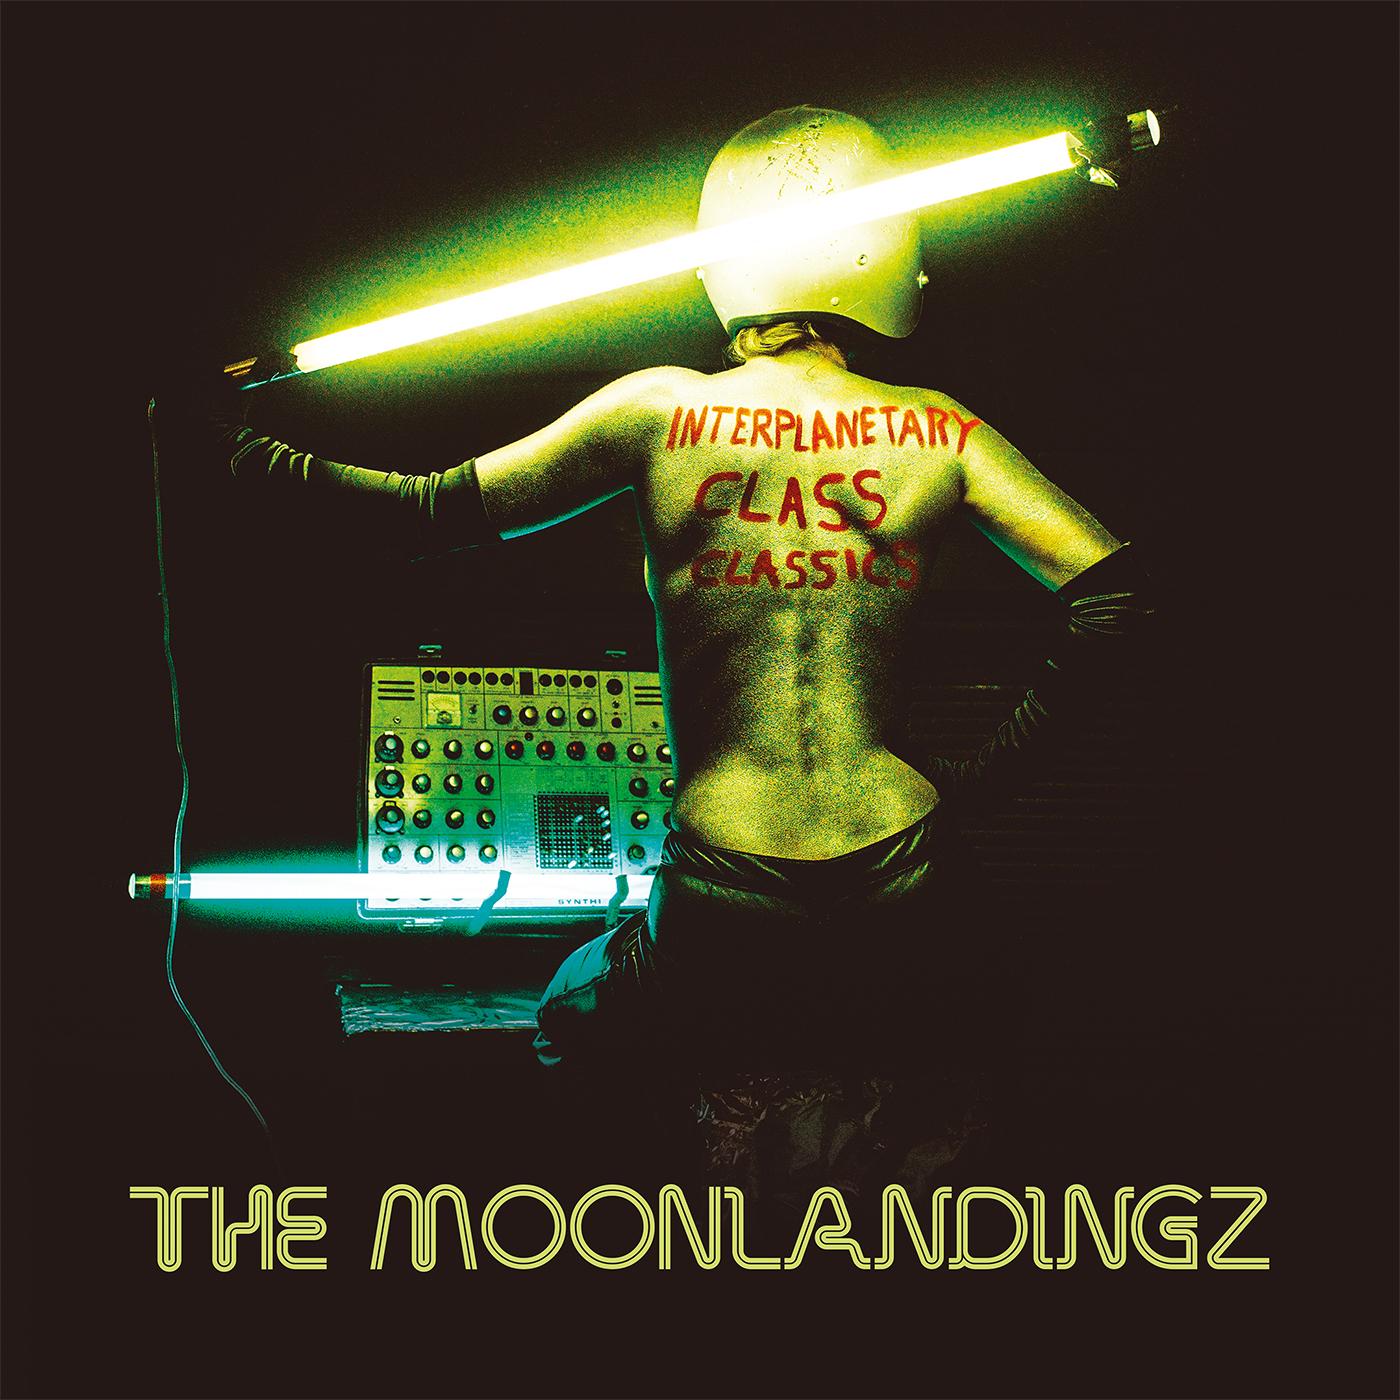 INTERPLANETARY CLASS CLASSICS - 2CD - The Moonlandingz